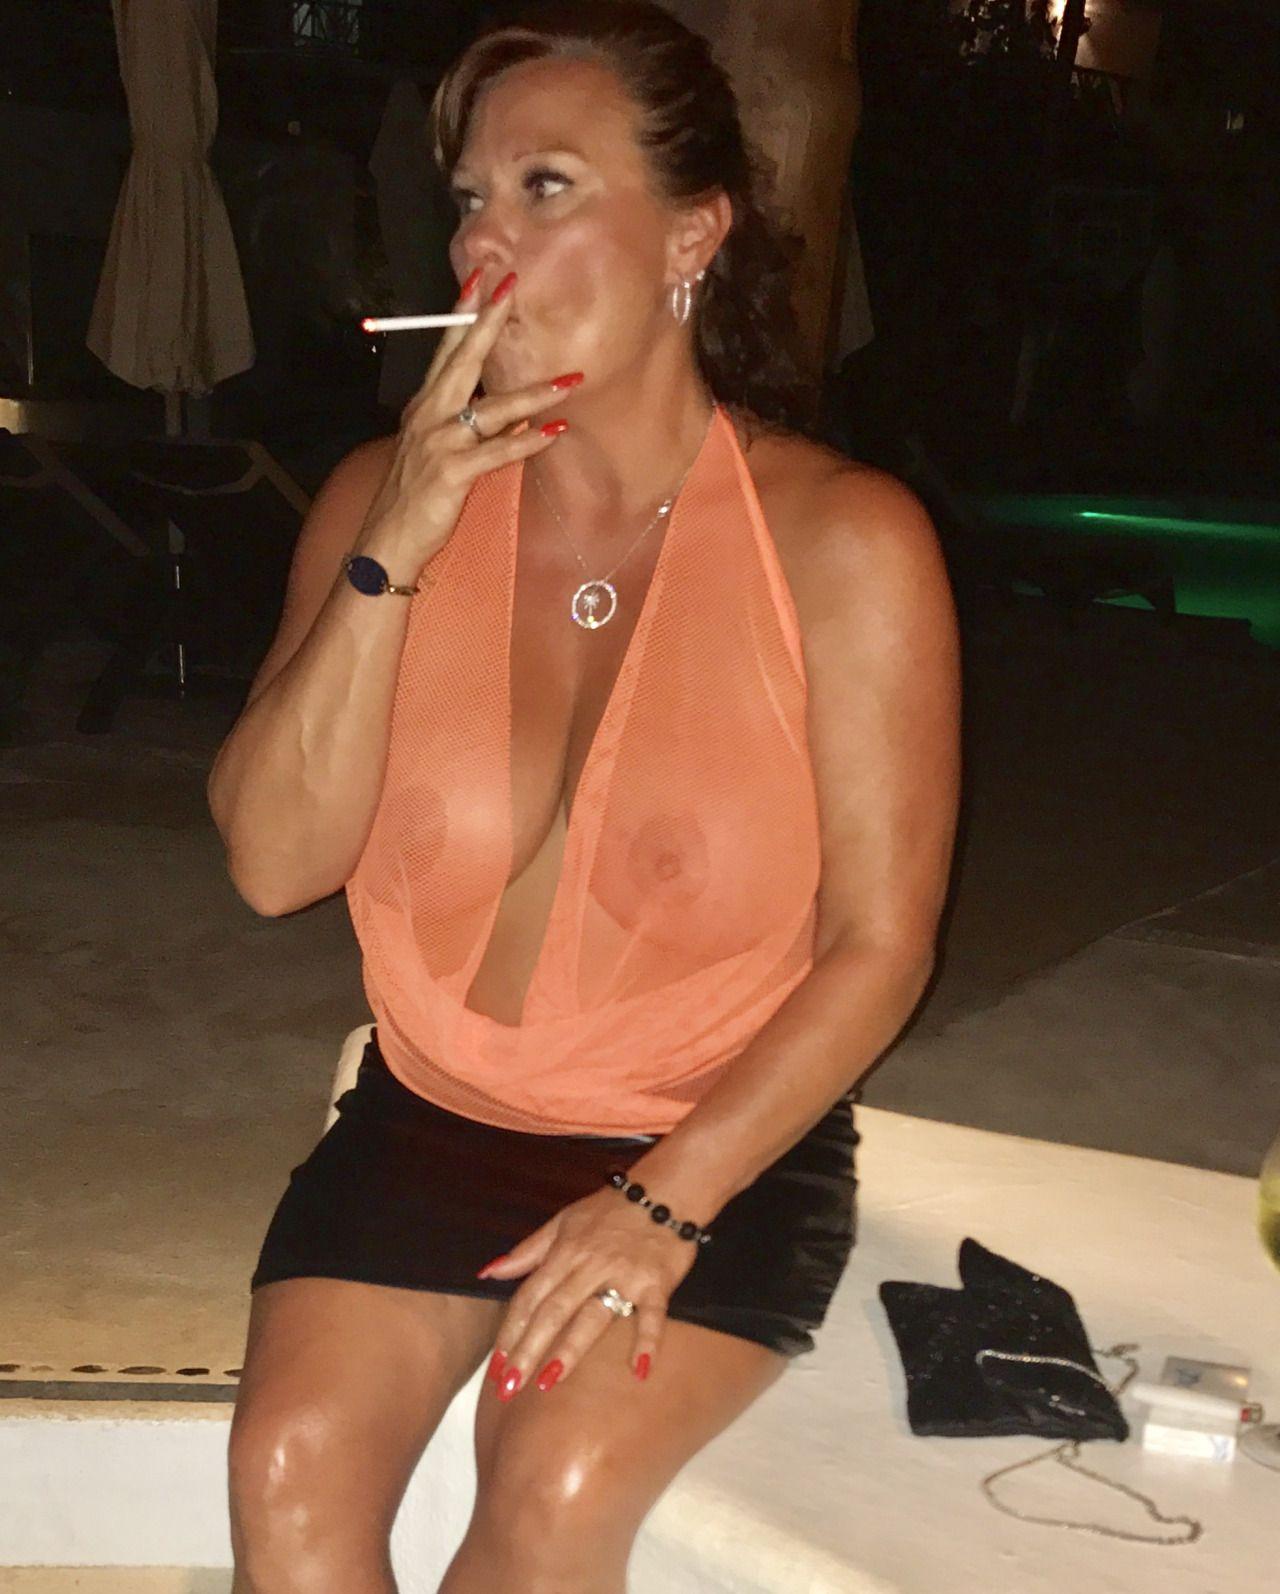 pintj eckleburg on smoking women | pinterest | smoking and woman